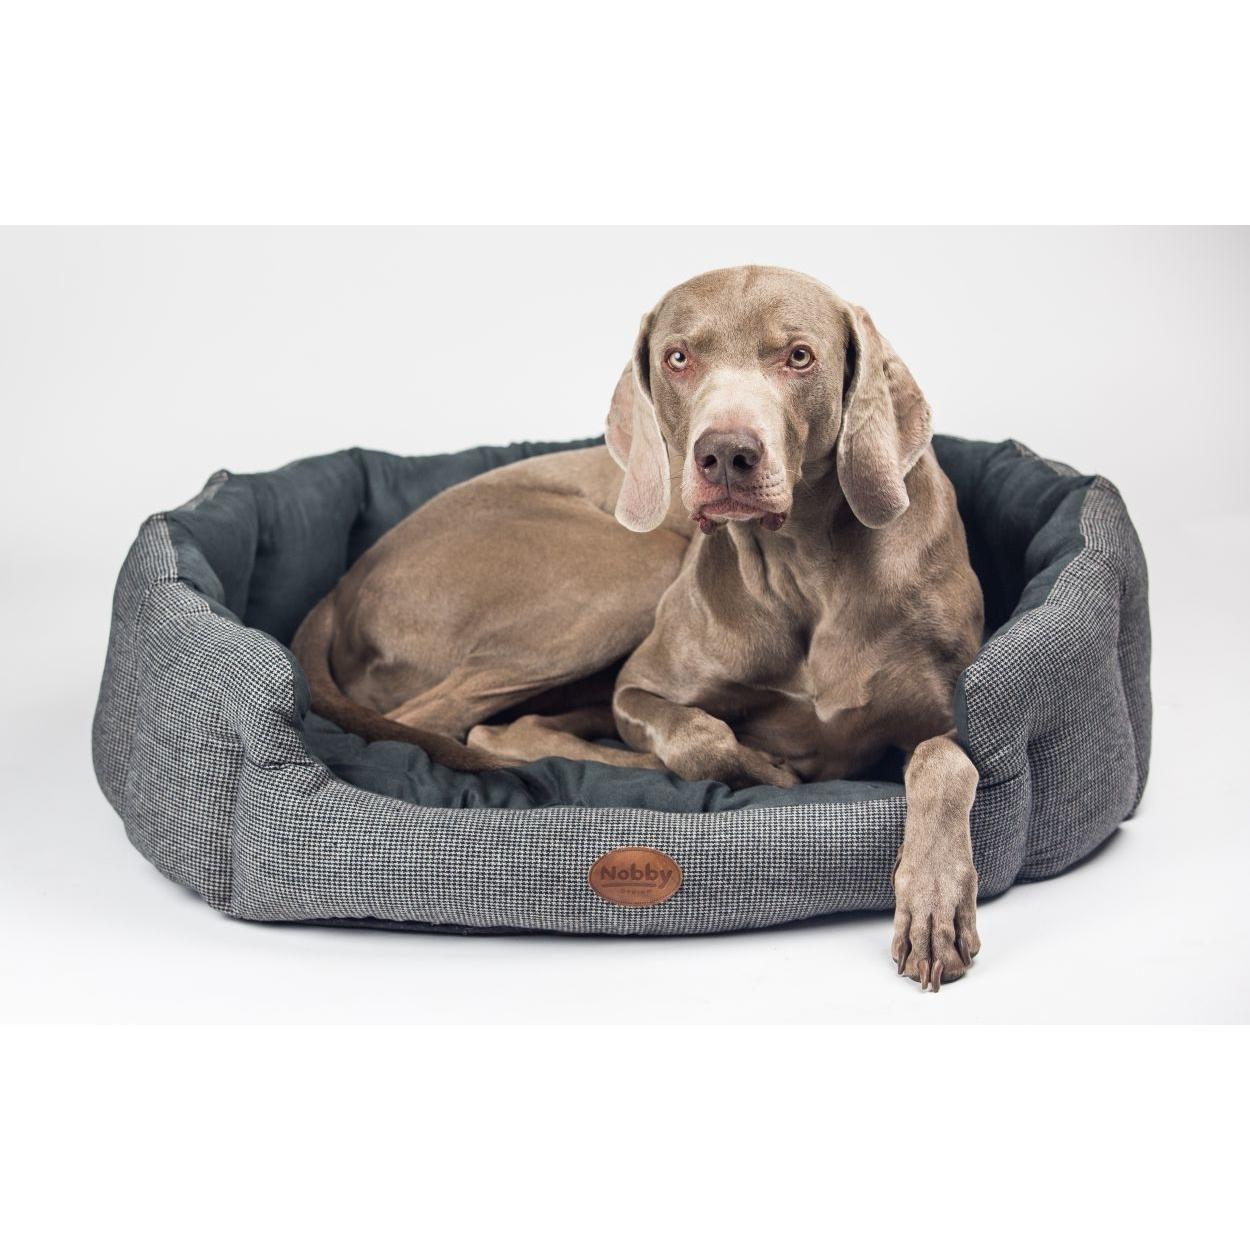 Nobby Komfort Hundebett Josi oval, Bild 2